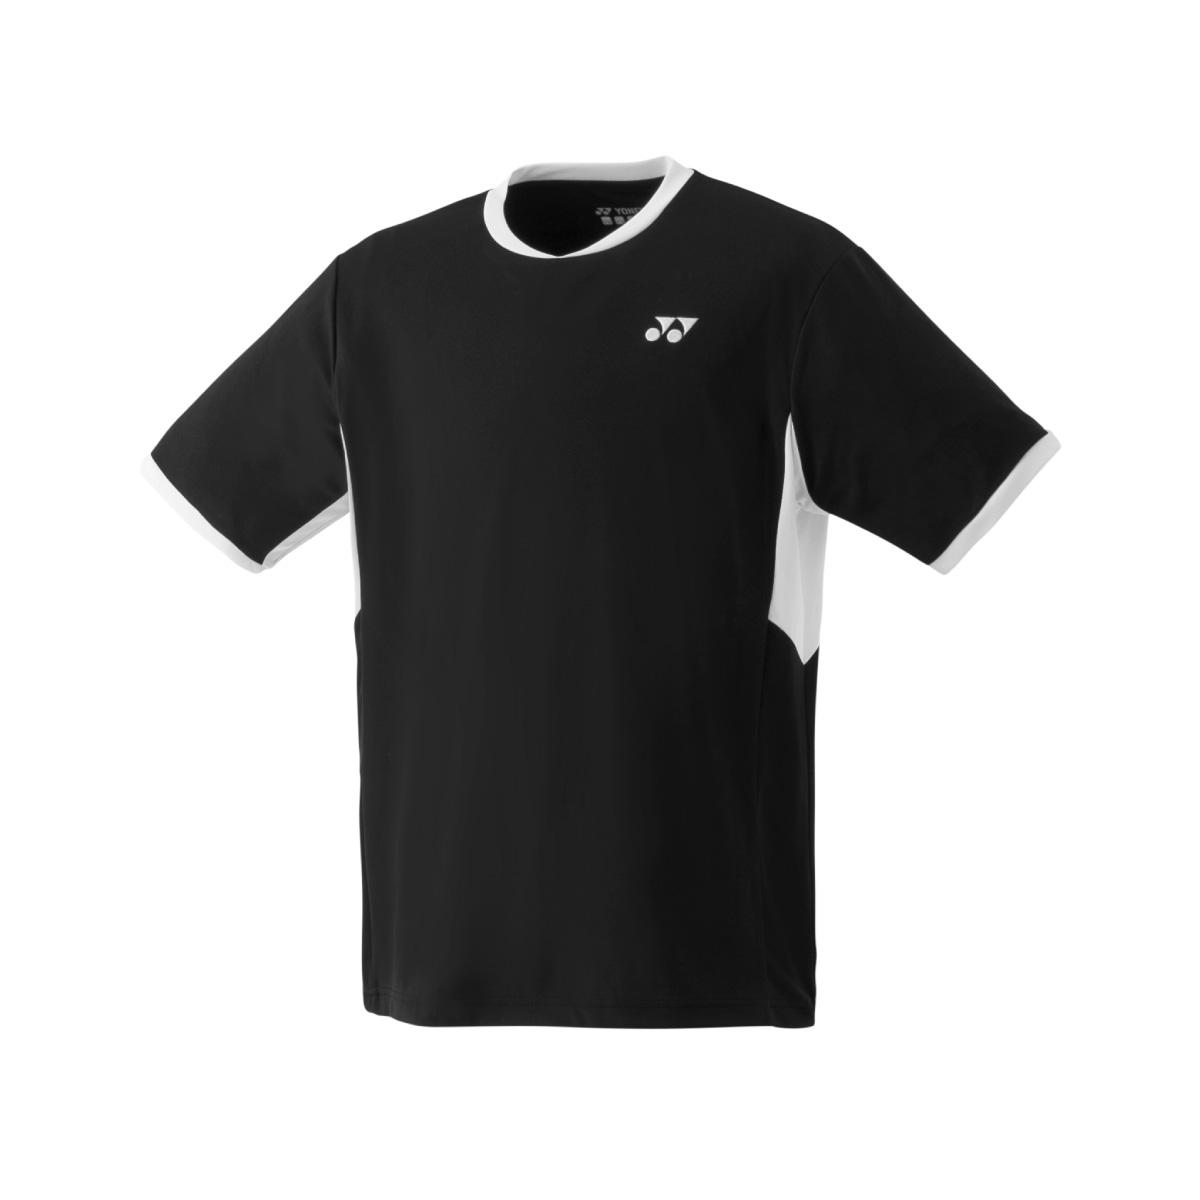 YONEX - Junior Crew Neck Shirt #YJ0010Detailbild - 2